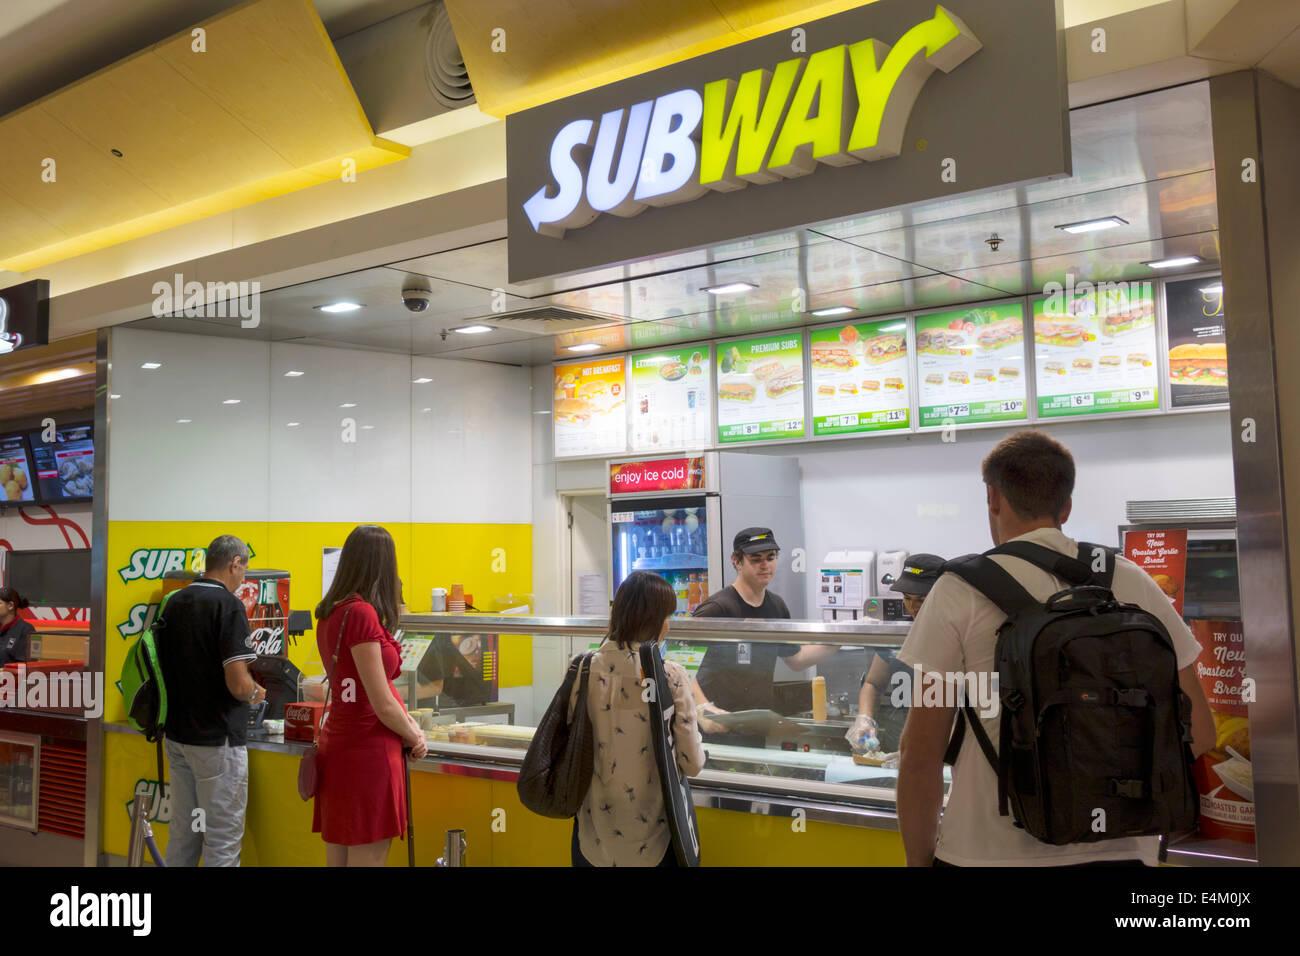 Subway Restaurant Counter Stock Photos & Subway Restaurant ...